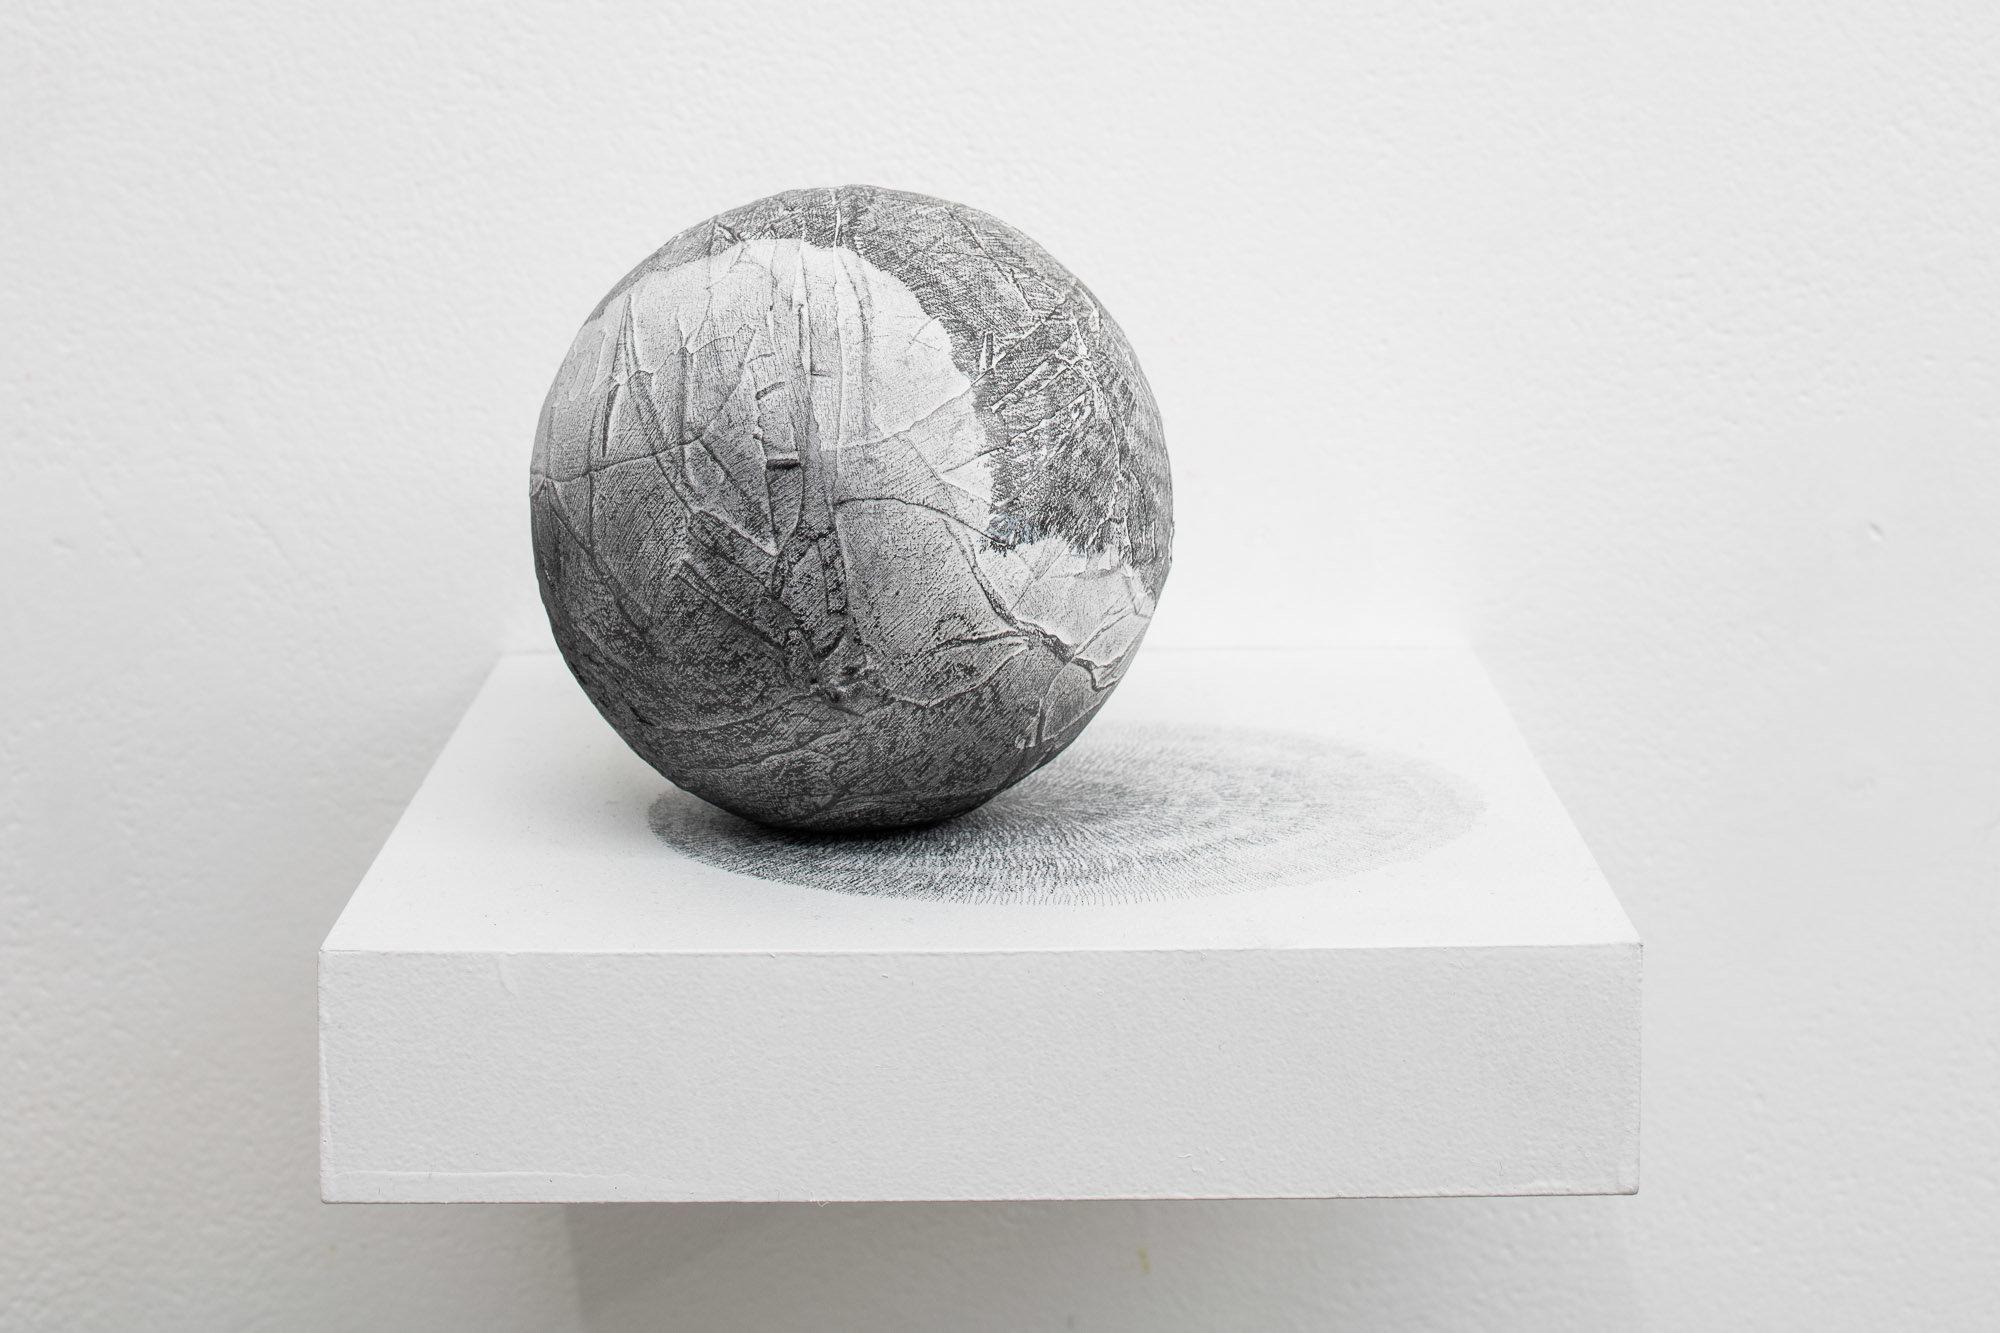 Residual #4 Pocket Globe,